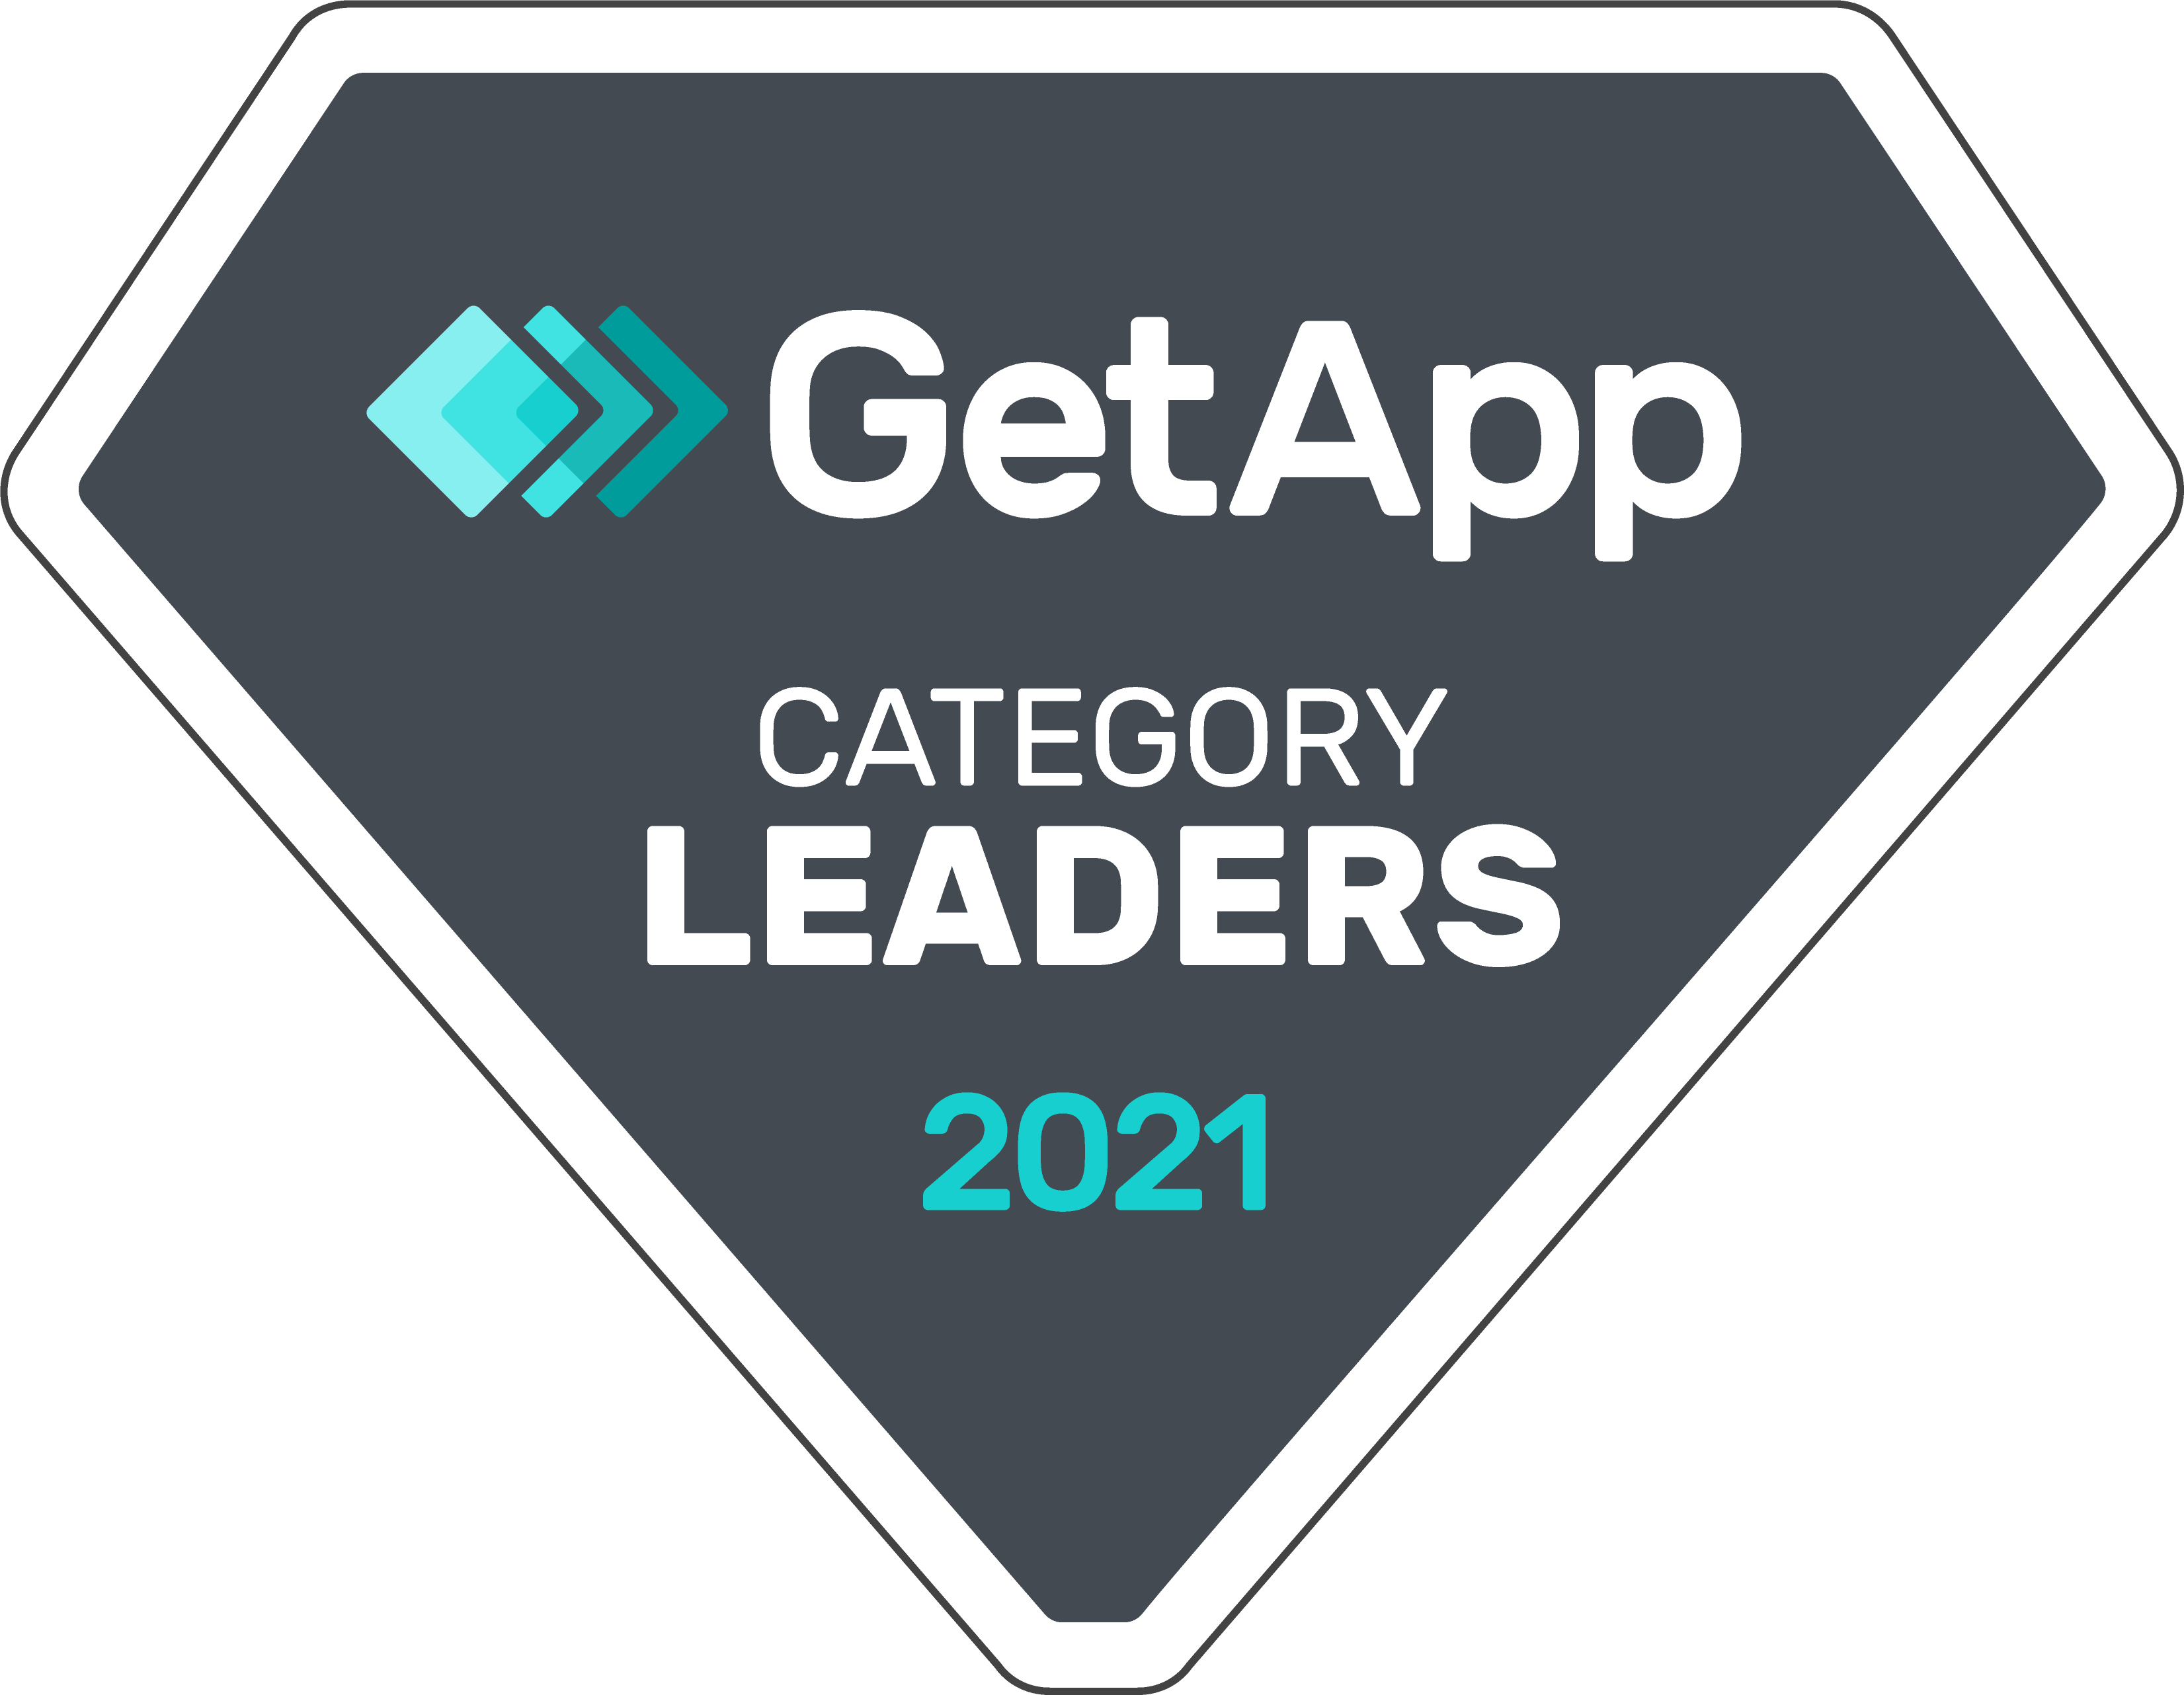 GetApp Category Leader 2021 Badge.